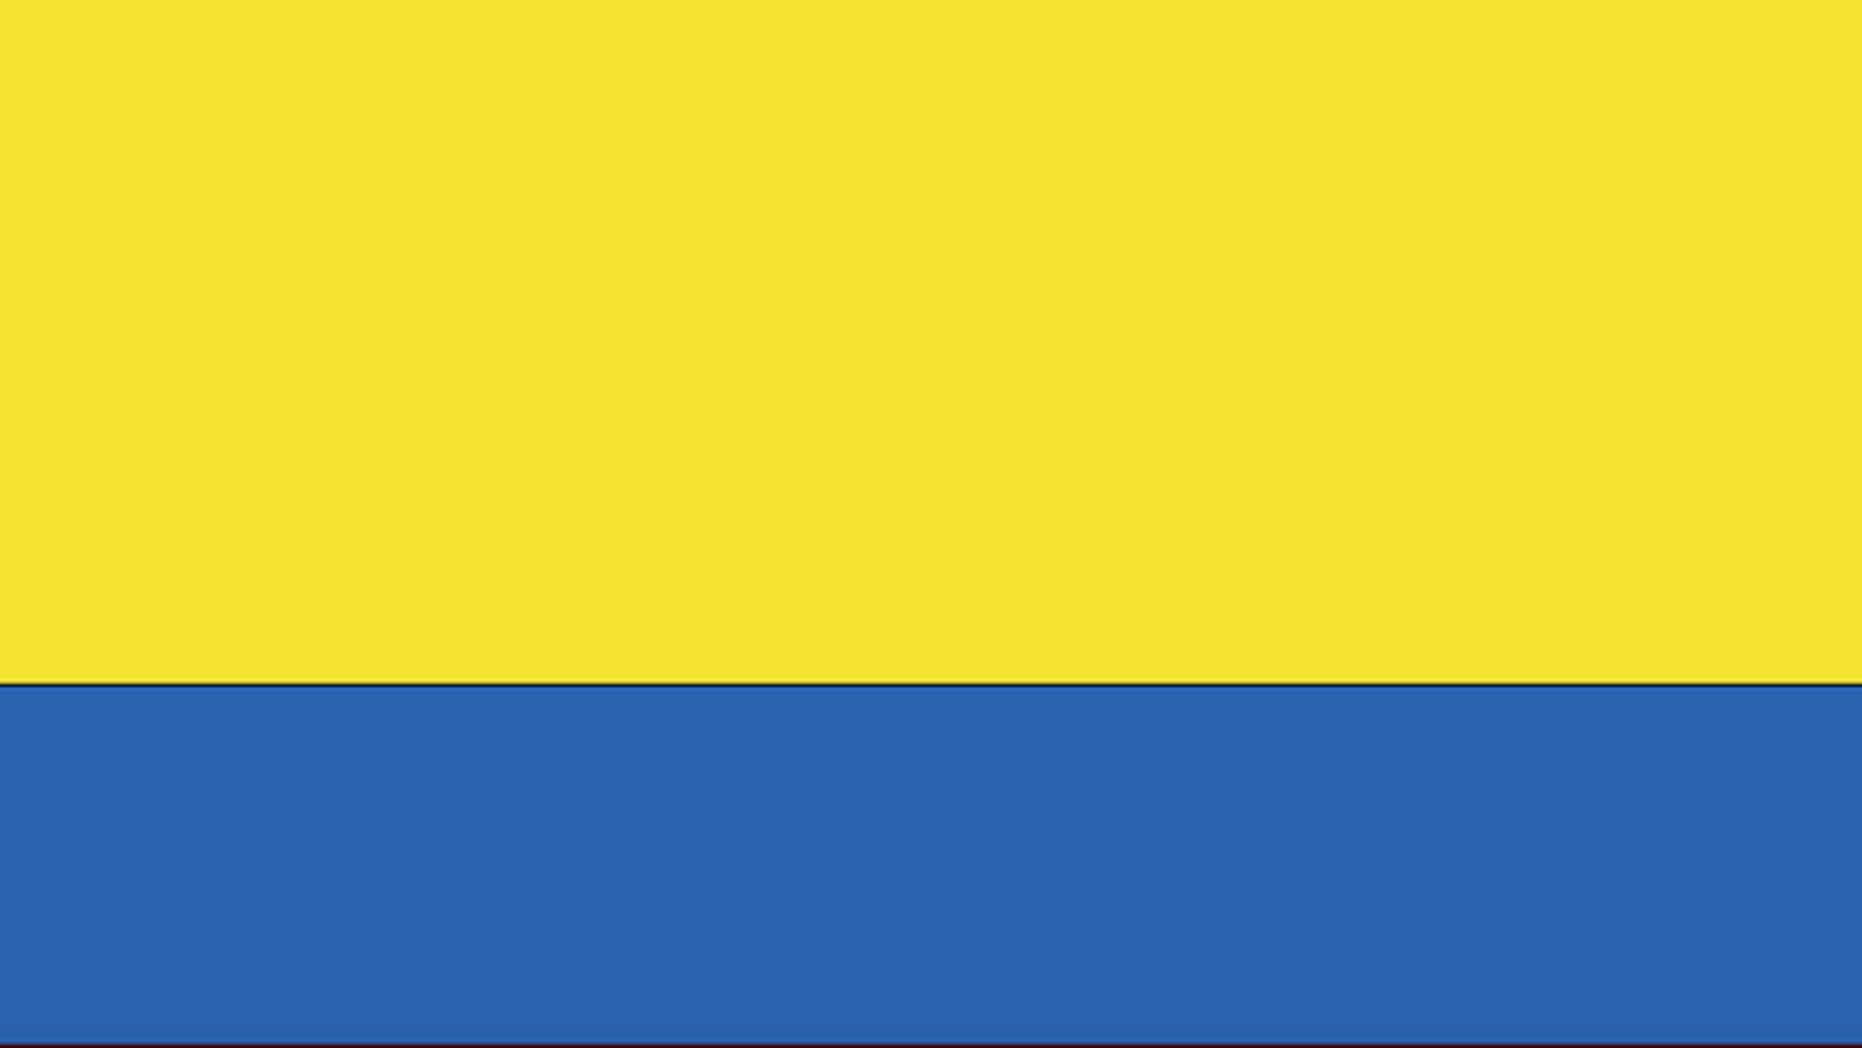 AP image/Colombian flag